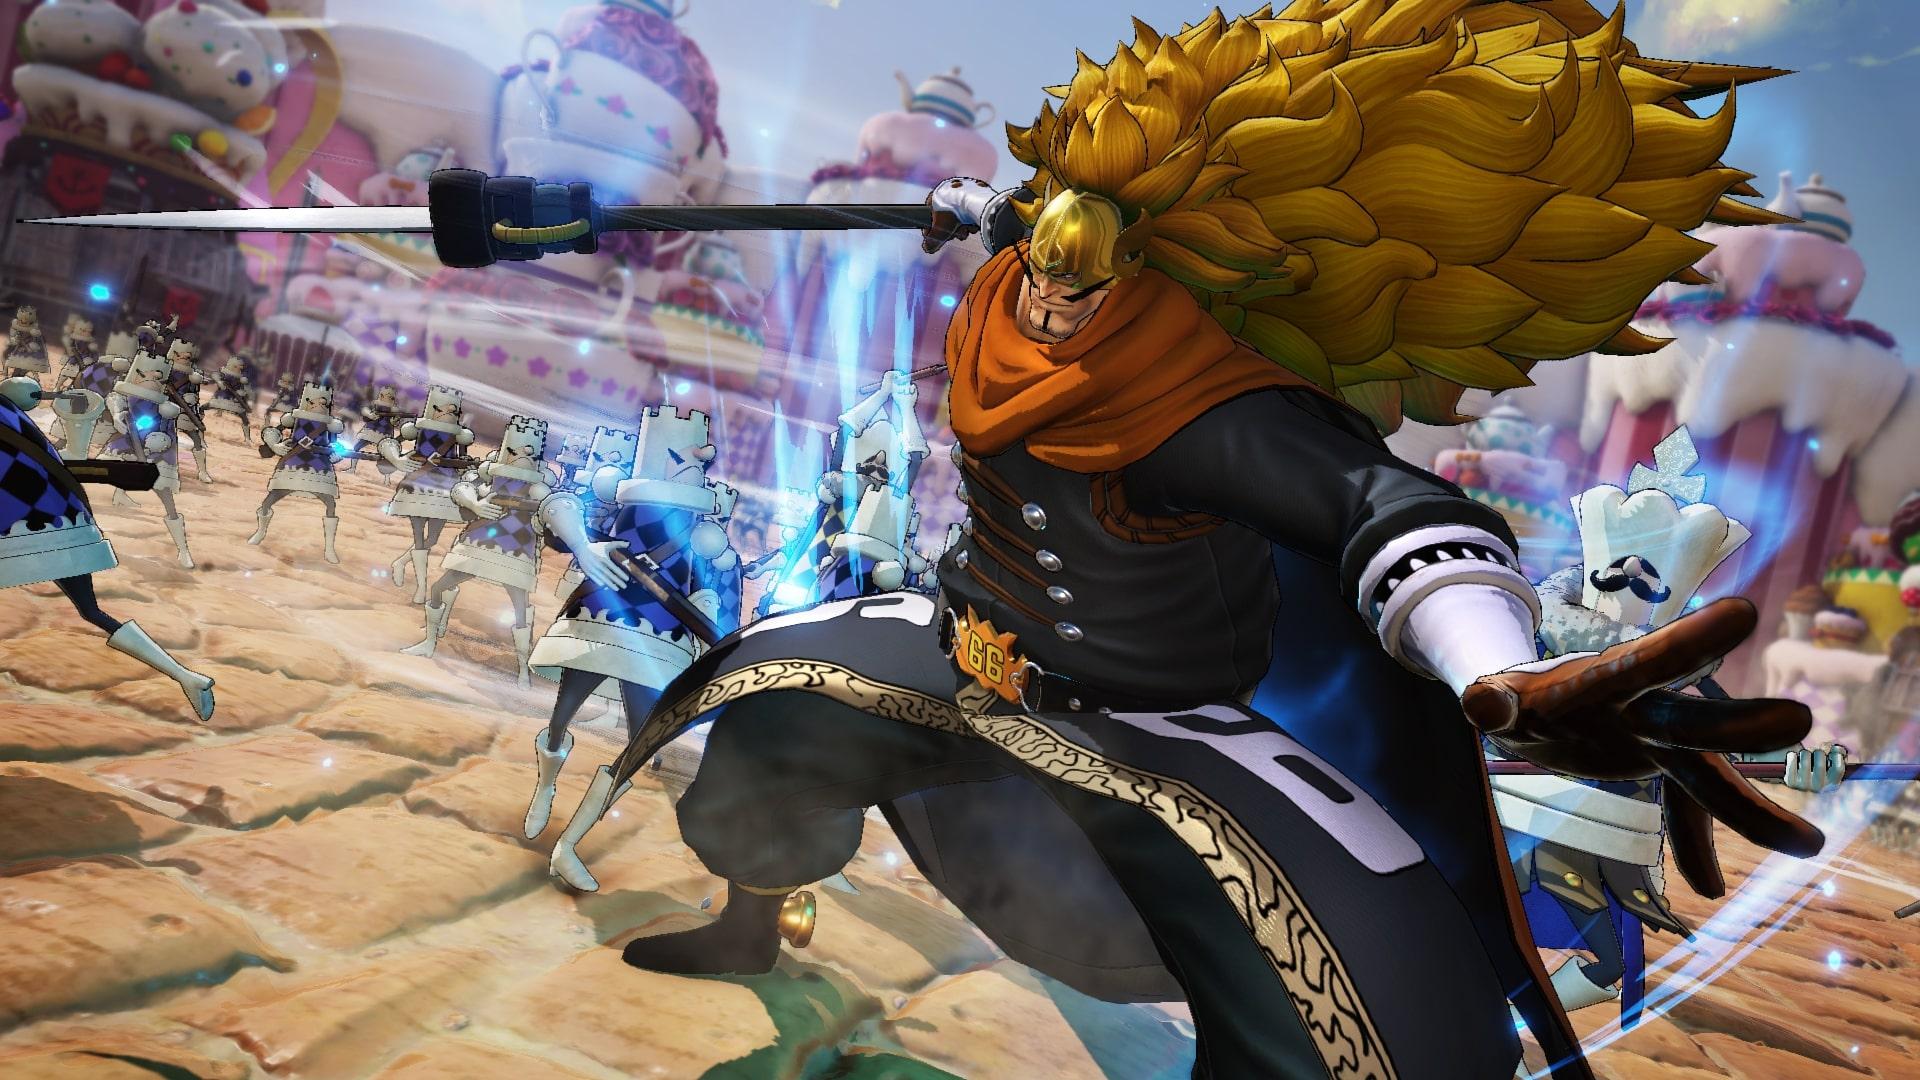 Vin smoke Judge - One Piece Pirate Warriors 4